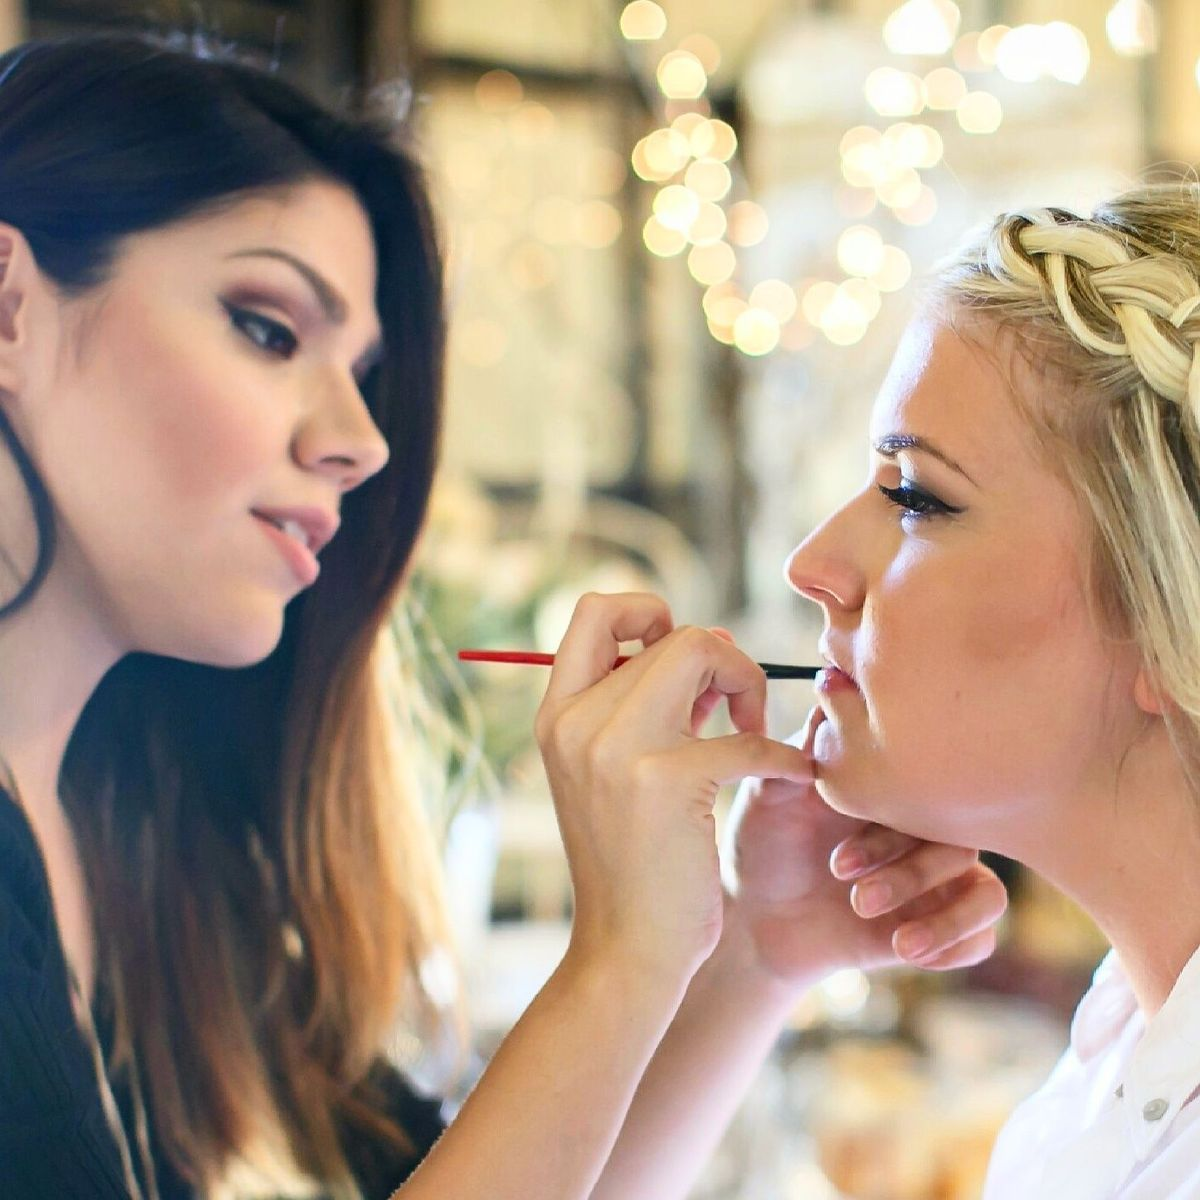 makeup by adie inc. - beauty & health - jacksonville, fl - weddingwire